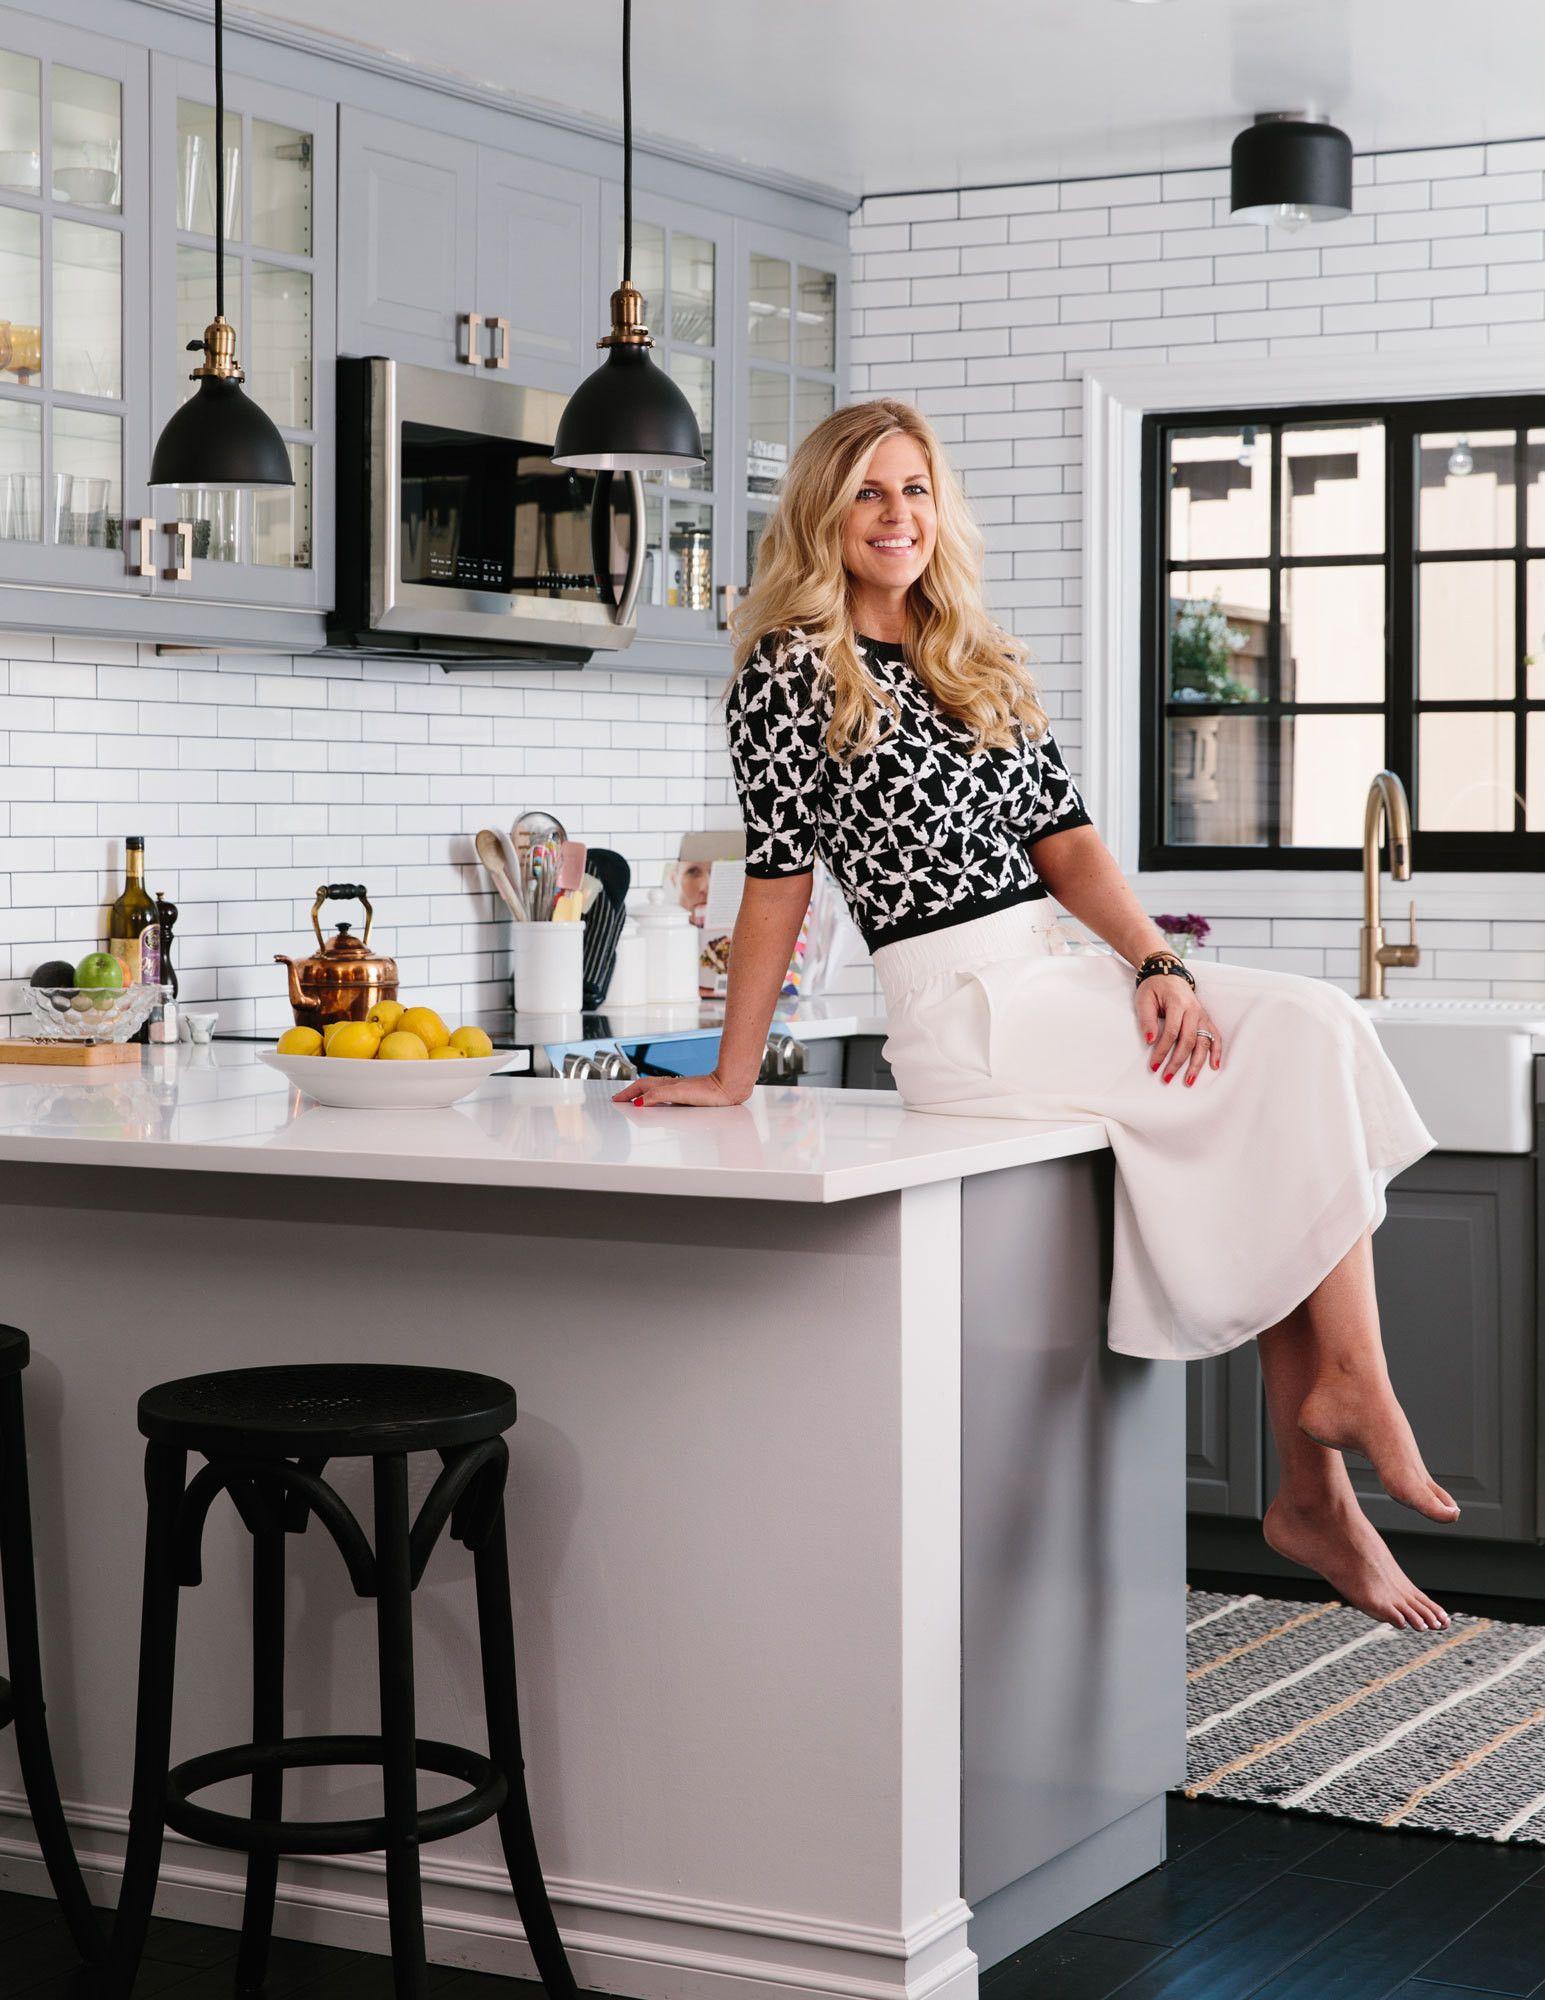 Ikea Kitchen Light Fixtures Ten Tips From Rundown Rental To Chic Starter Home Cabinets